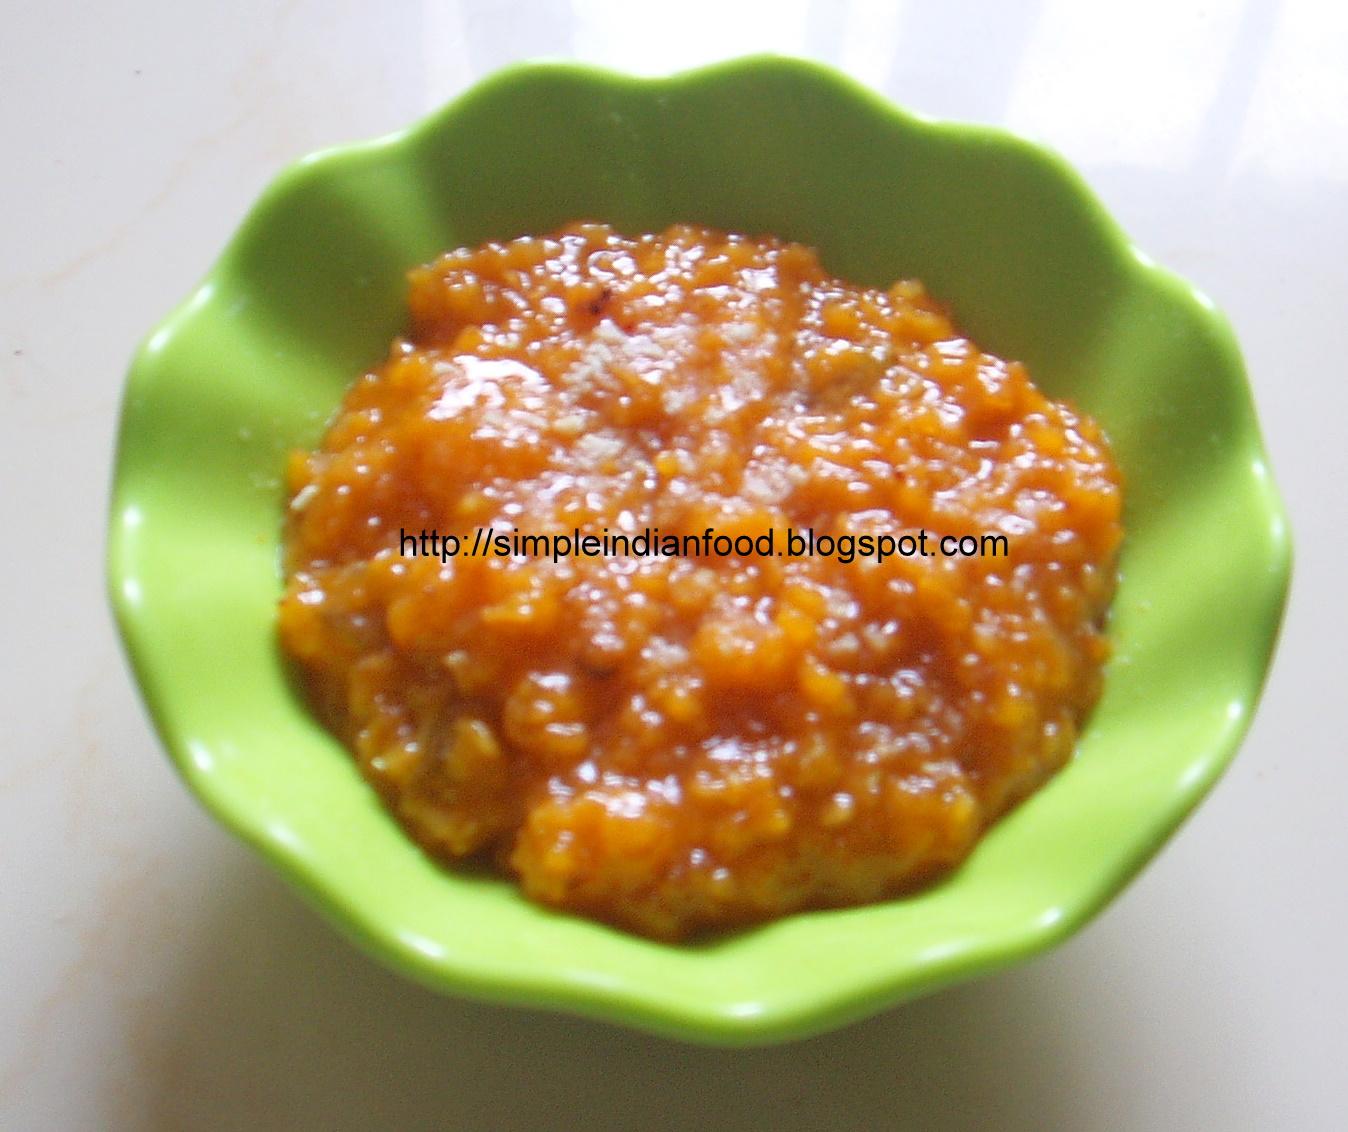 Simple Indian Food- An Easy Cooking Blog: Oats kesari